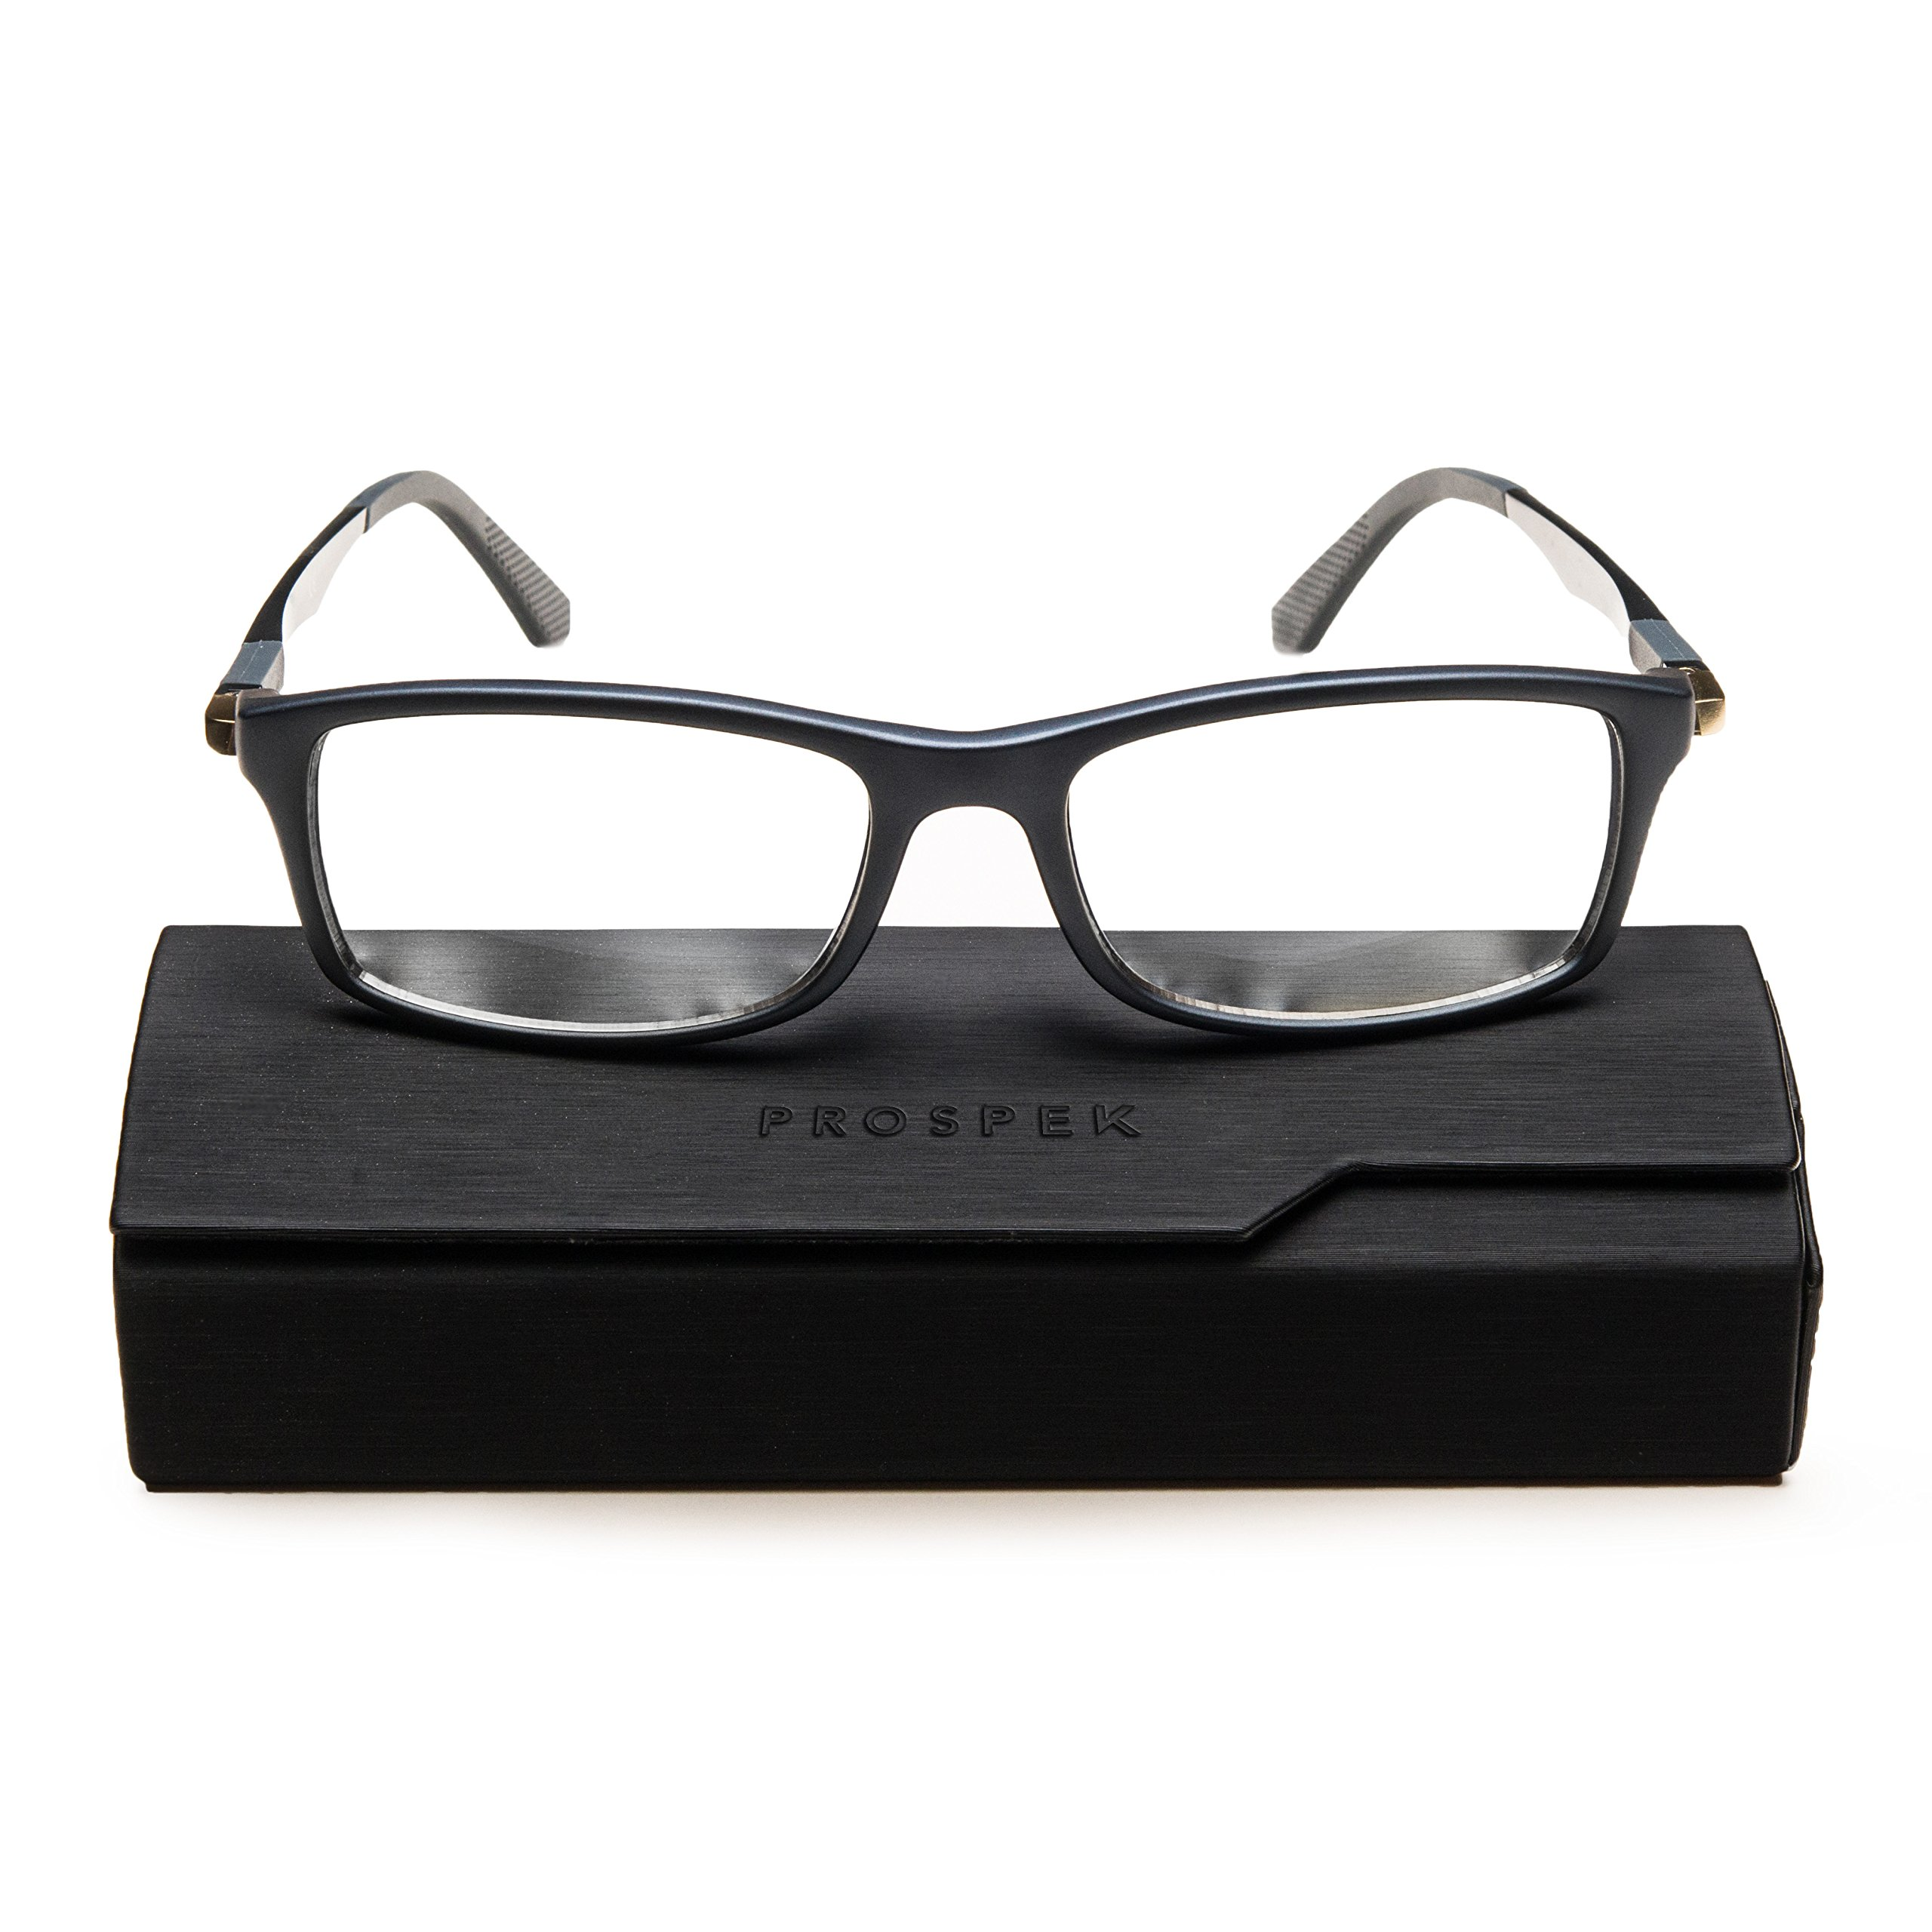 PROSPEK - Computer Glasses - Blue Light Blocking Glasses - Dynamic (+0.00 (No Magnification)   Regular Size, Gray) by Prospek